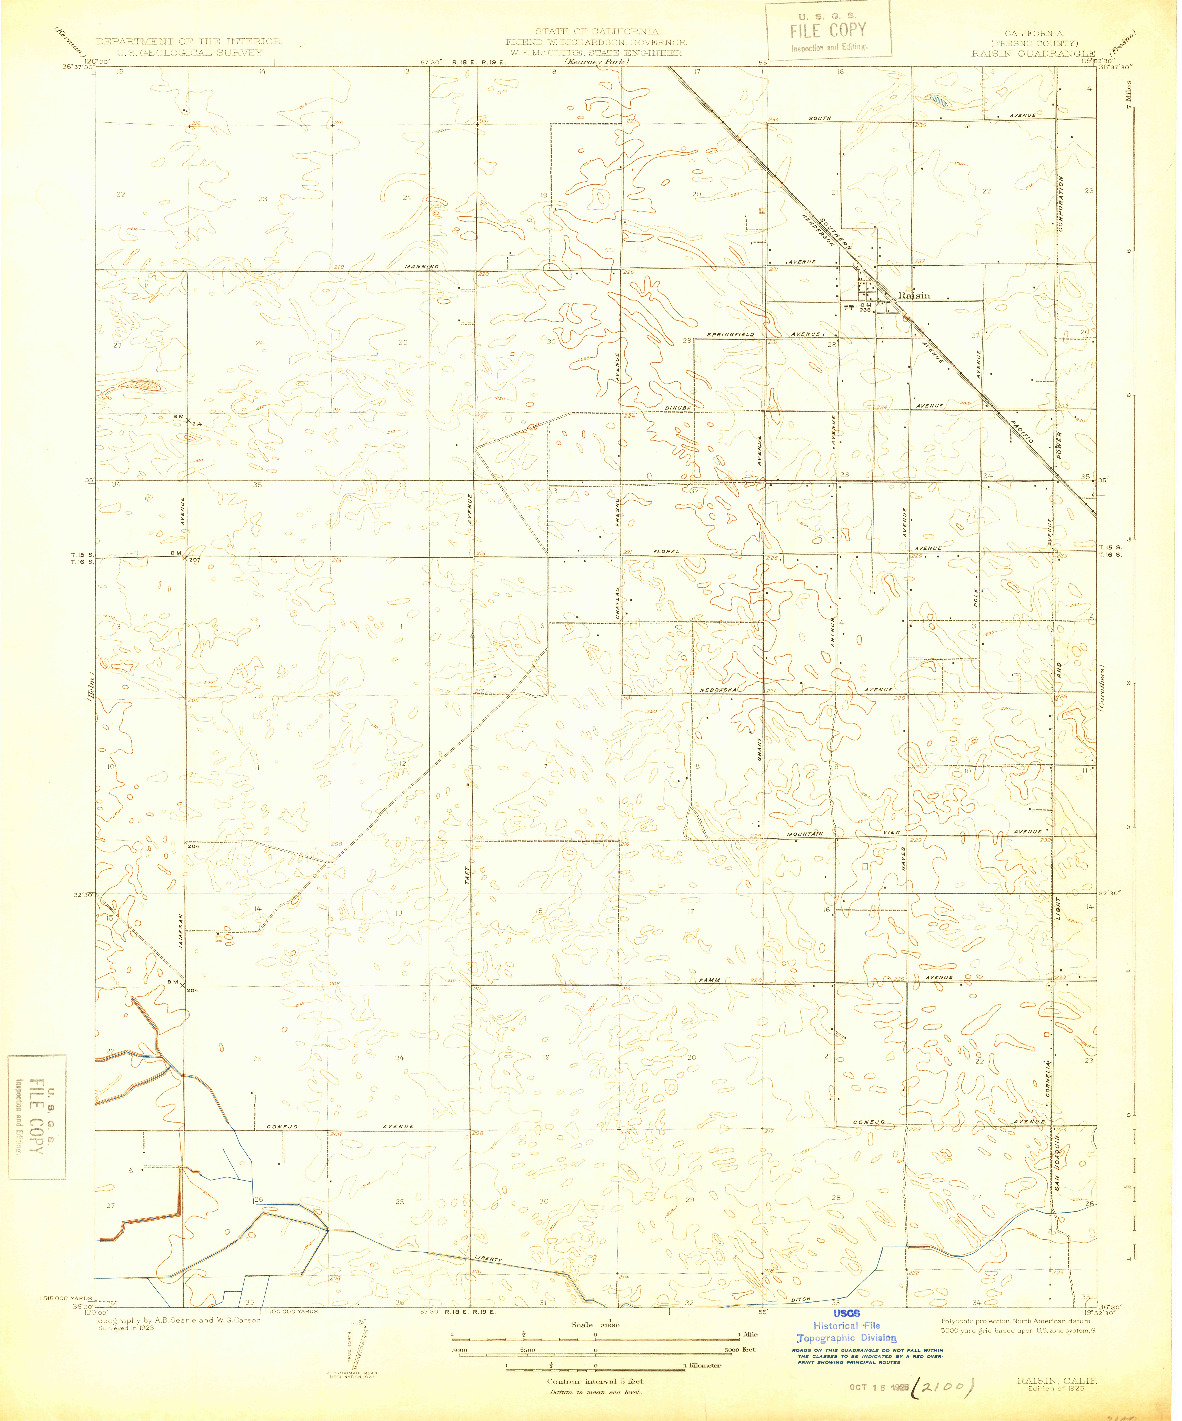 USGS 1:31680-SCALE QUADRANGLE FOR RAISIN, CA 1925